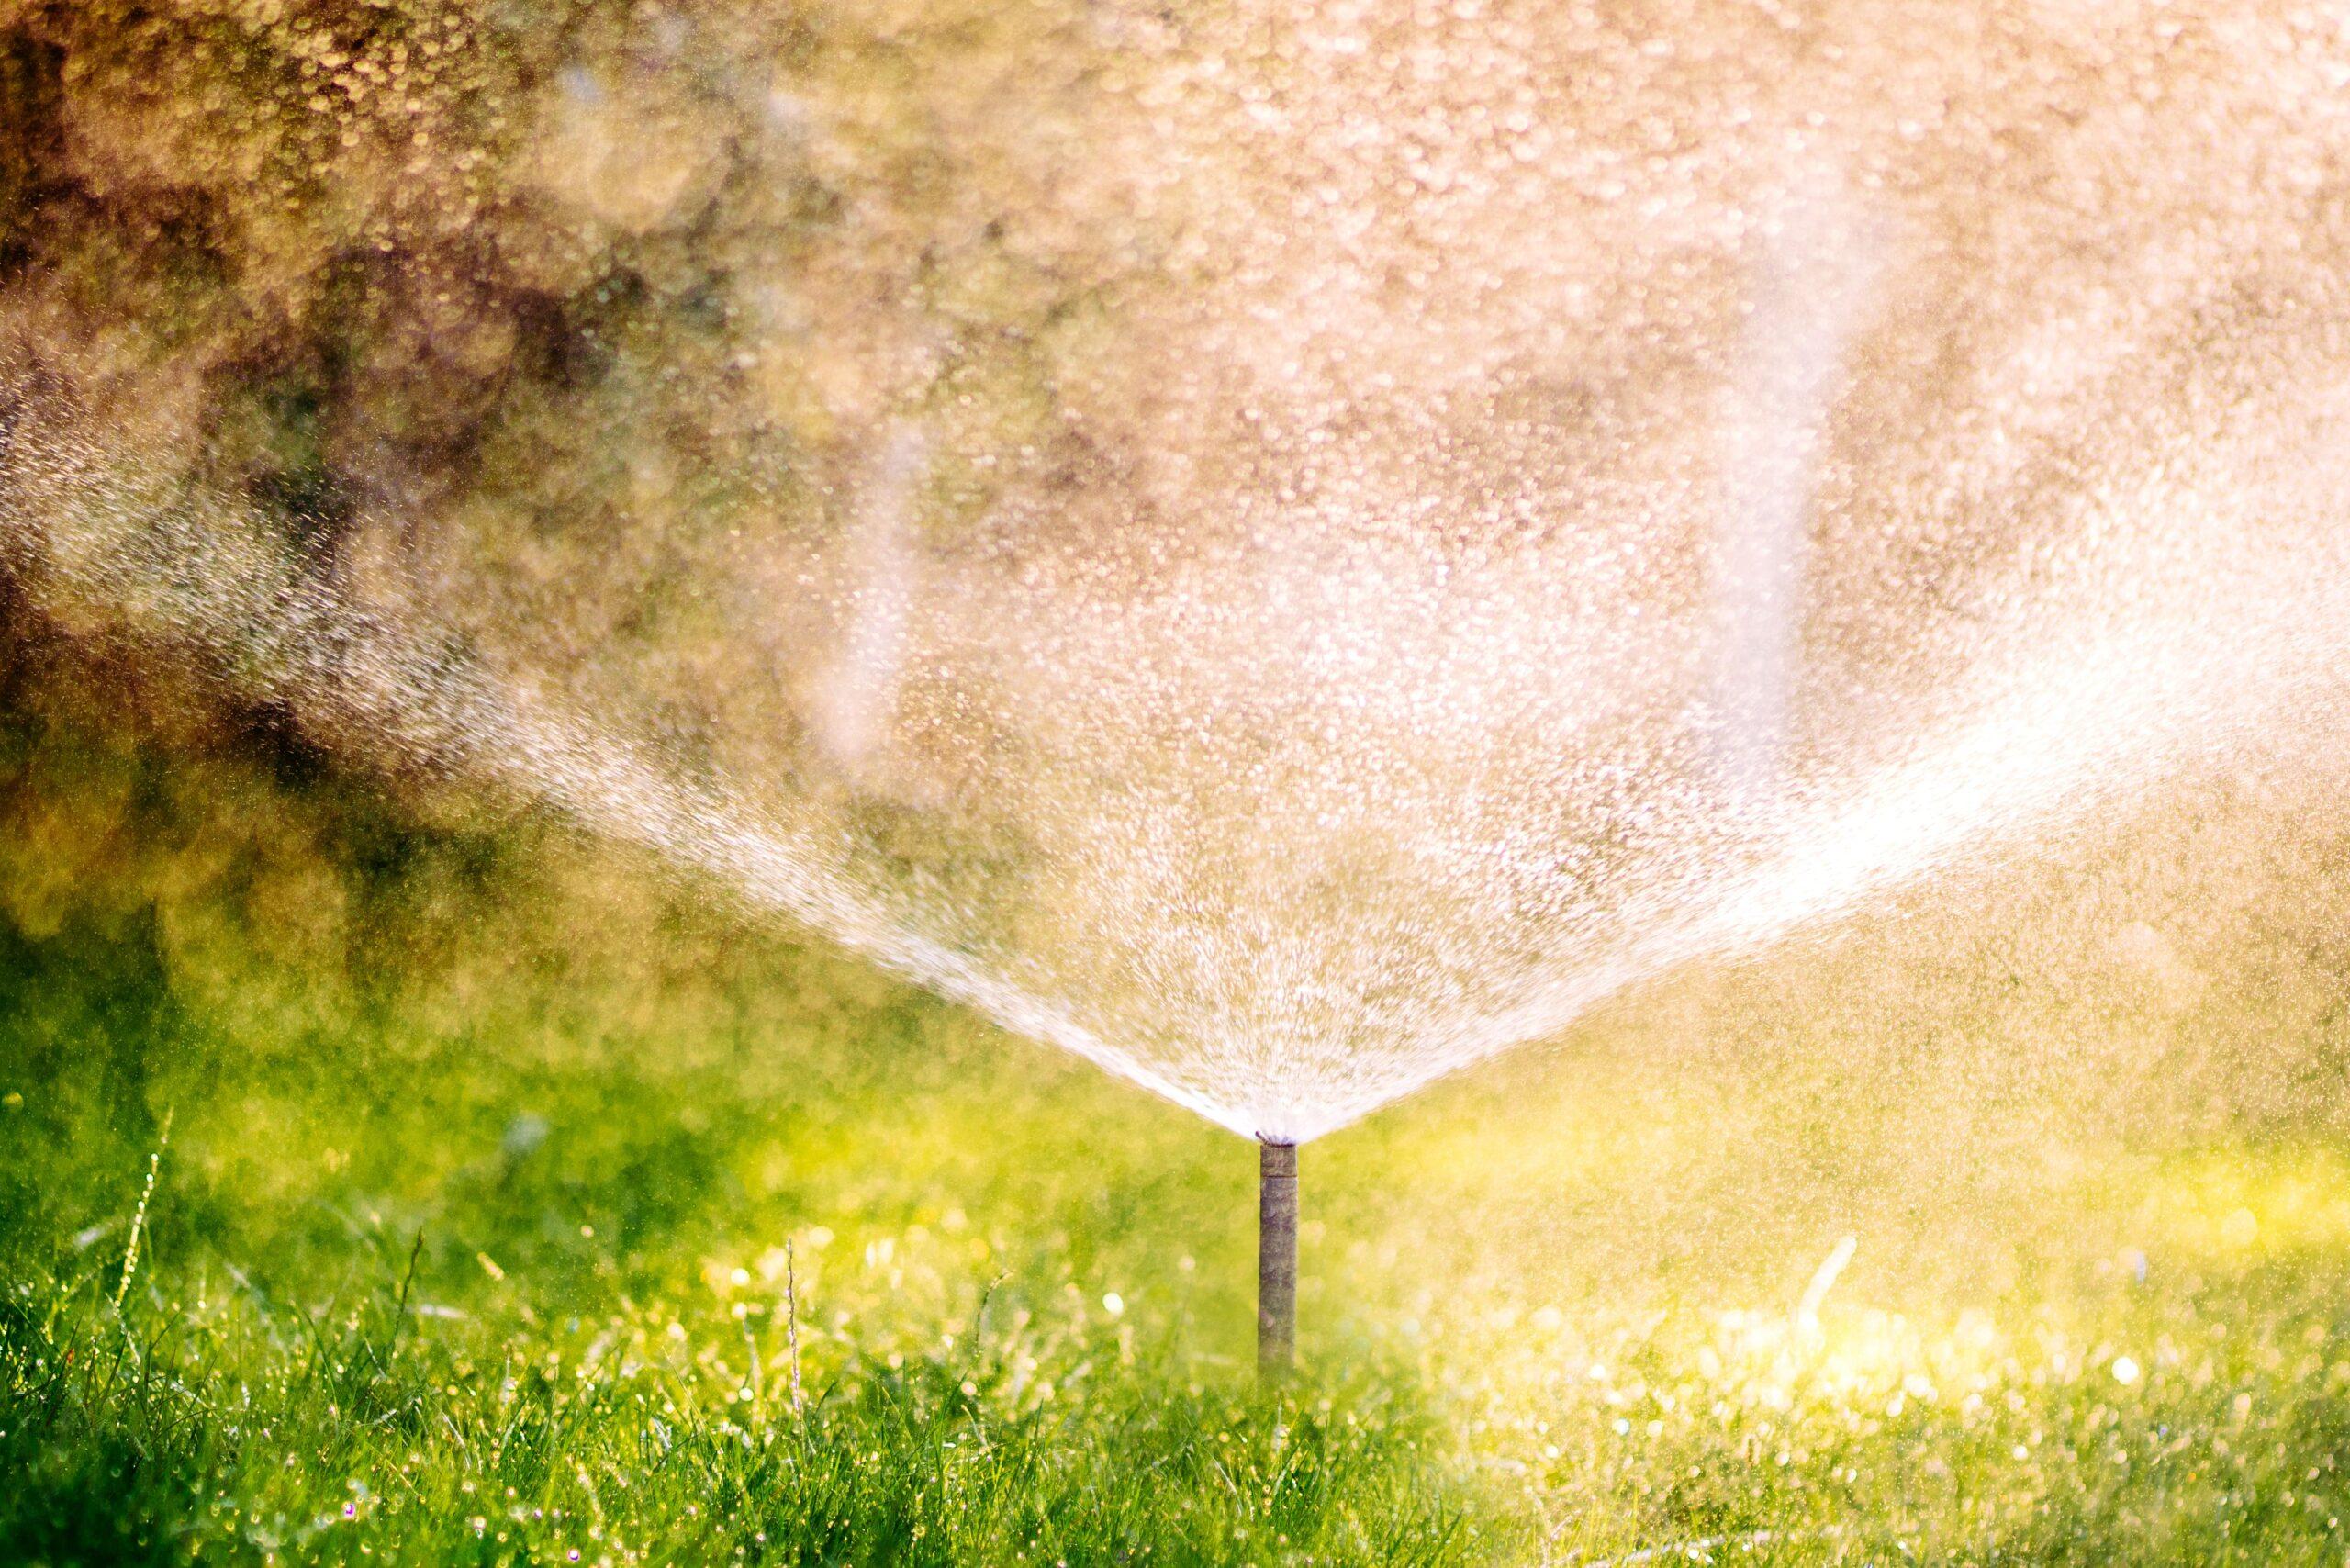 close-up-details-of-automatic-lawn-pop-up-sprinkle-KVZMPKX-min